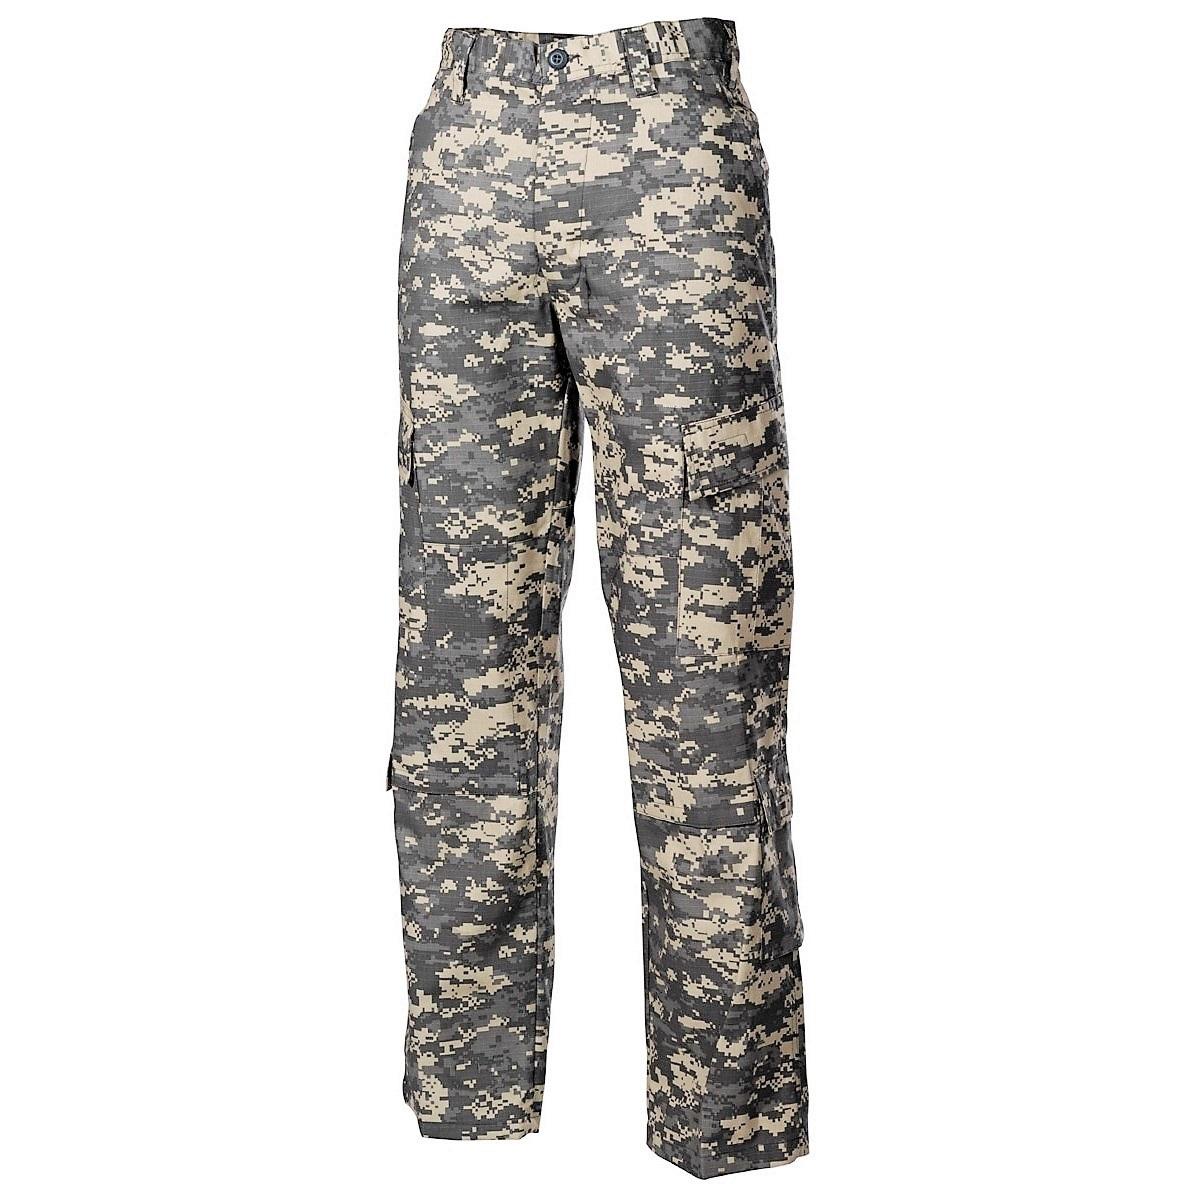 Kalhoty ACU AT-DIGITAL ripstop MFH Vyberte velikost: XS/R